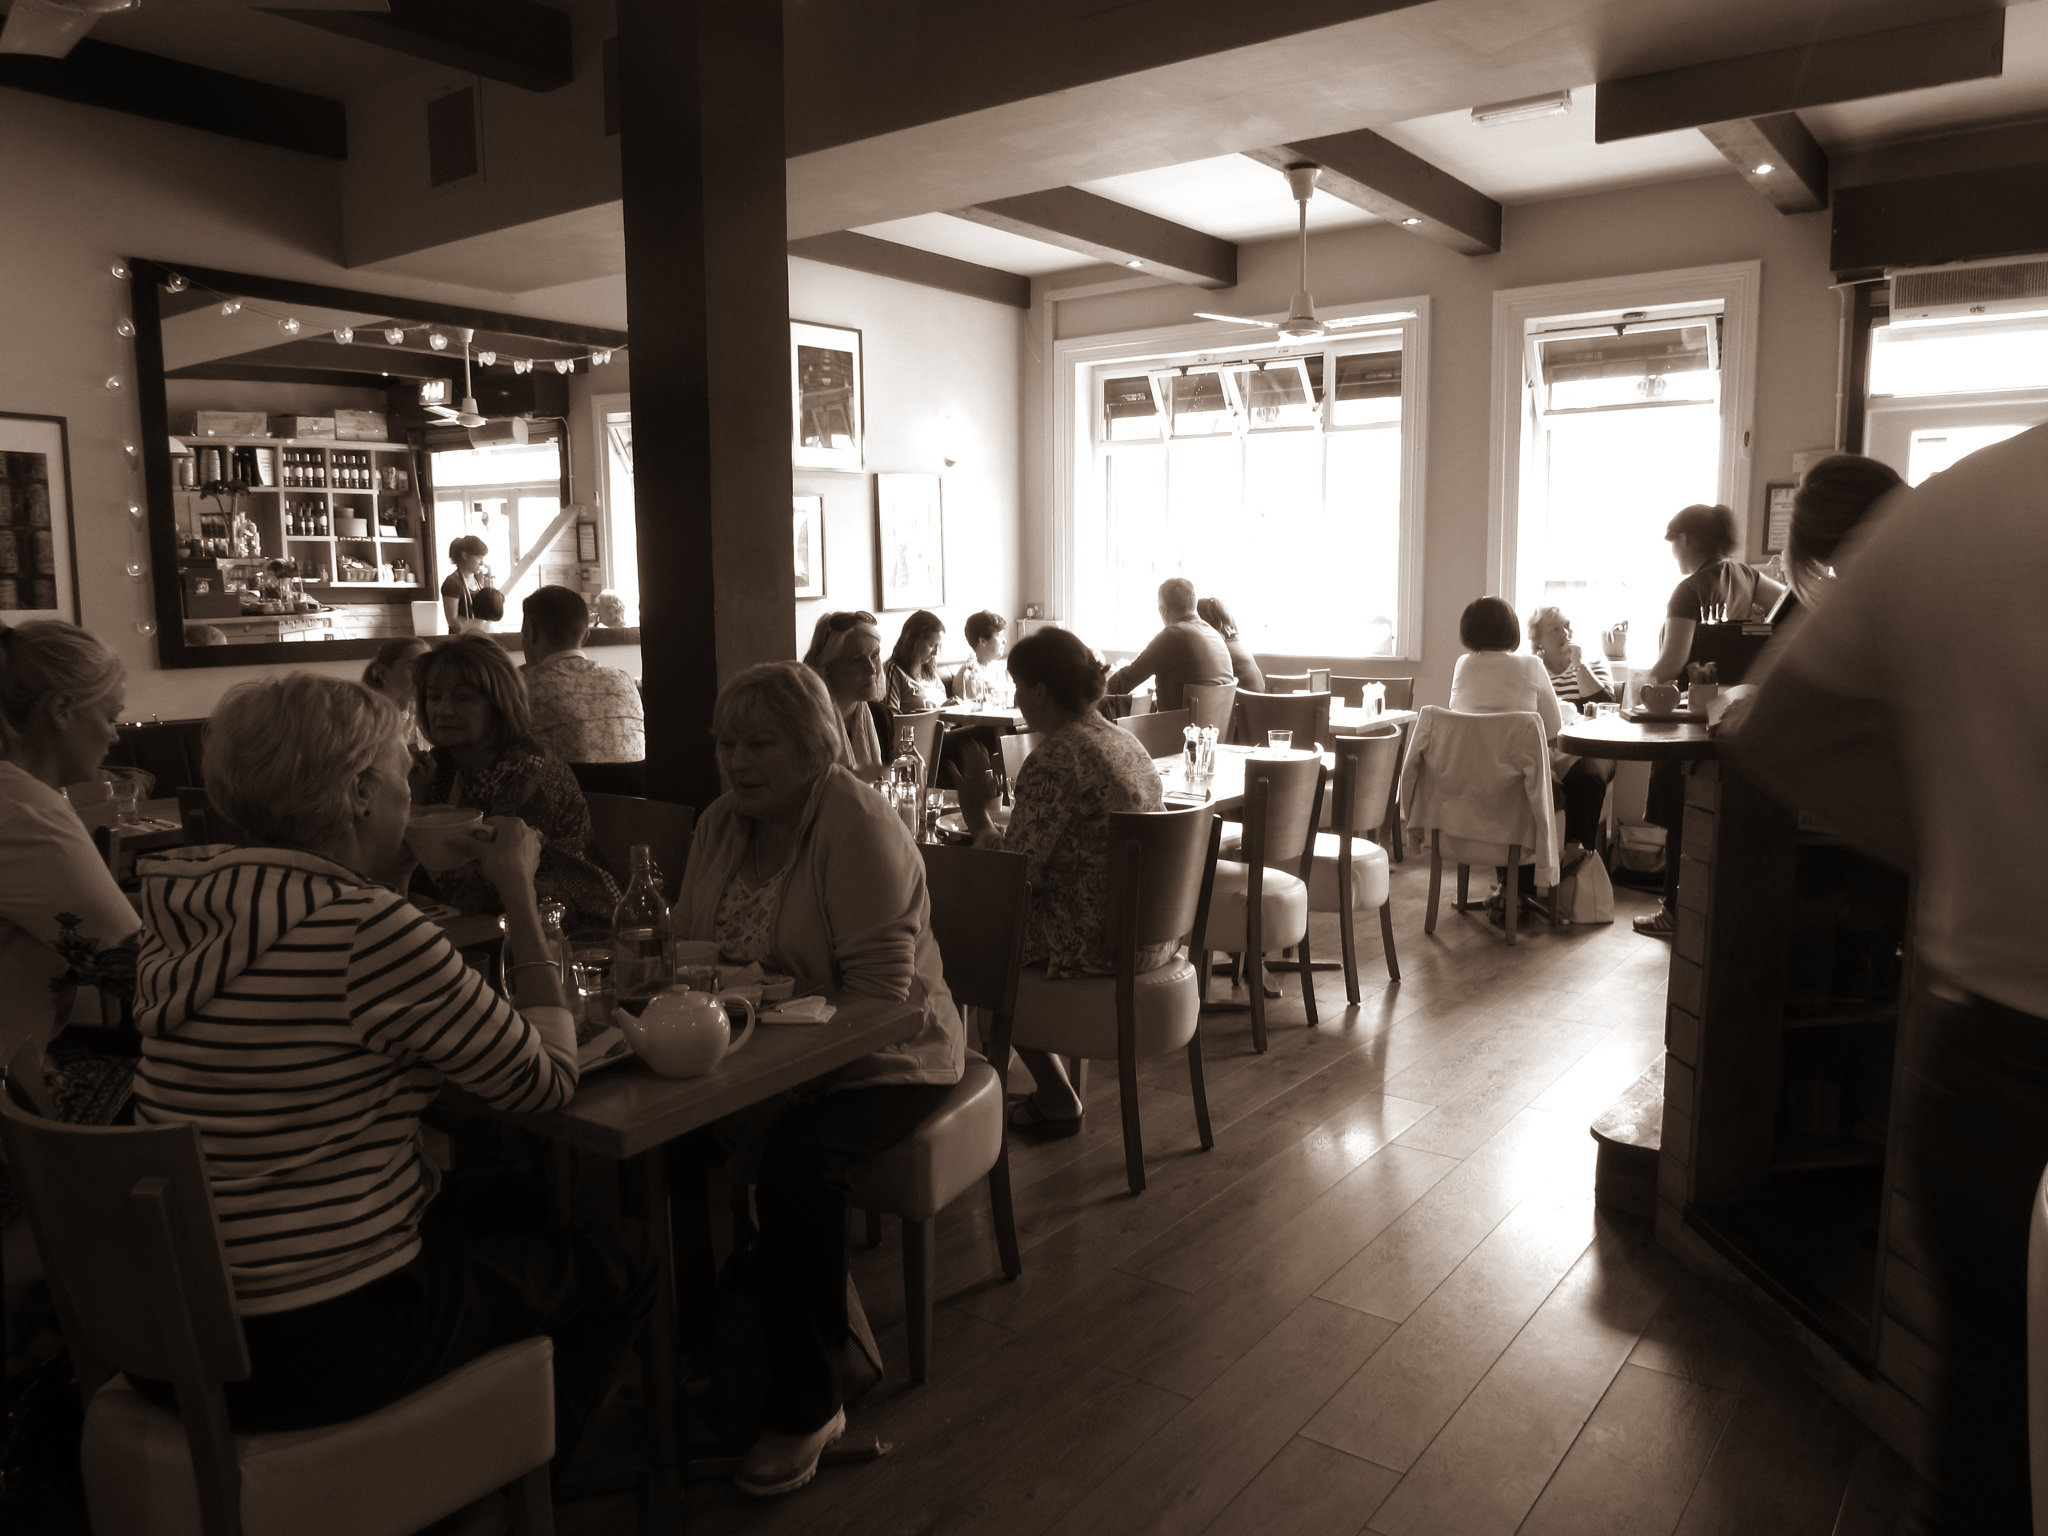 breakfast and brunch at twenty2 restaurant, dublin 9